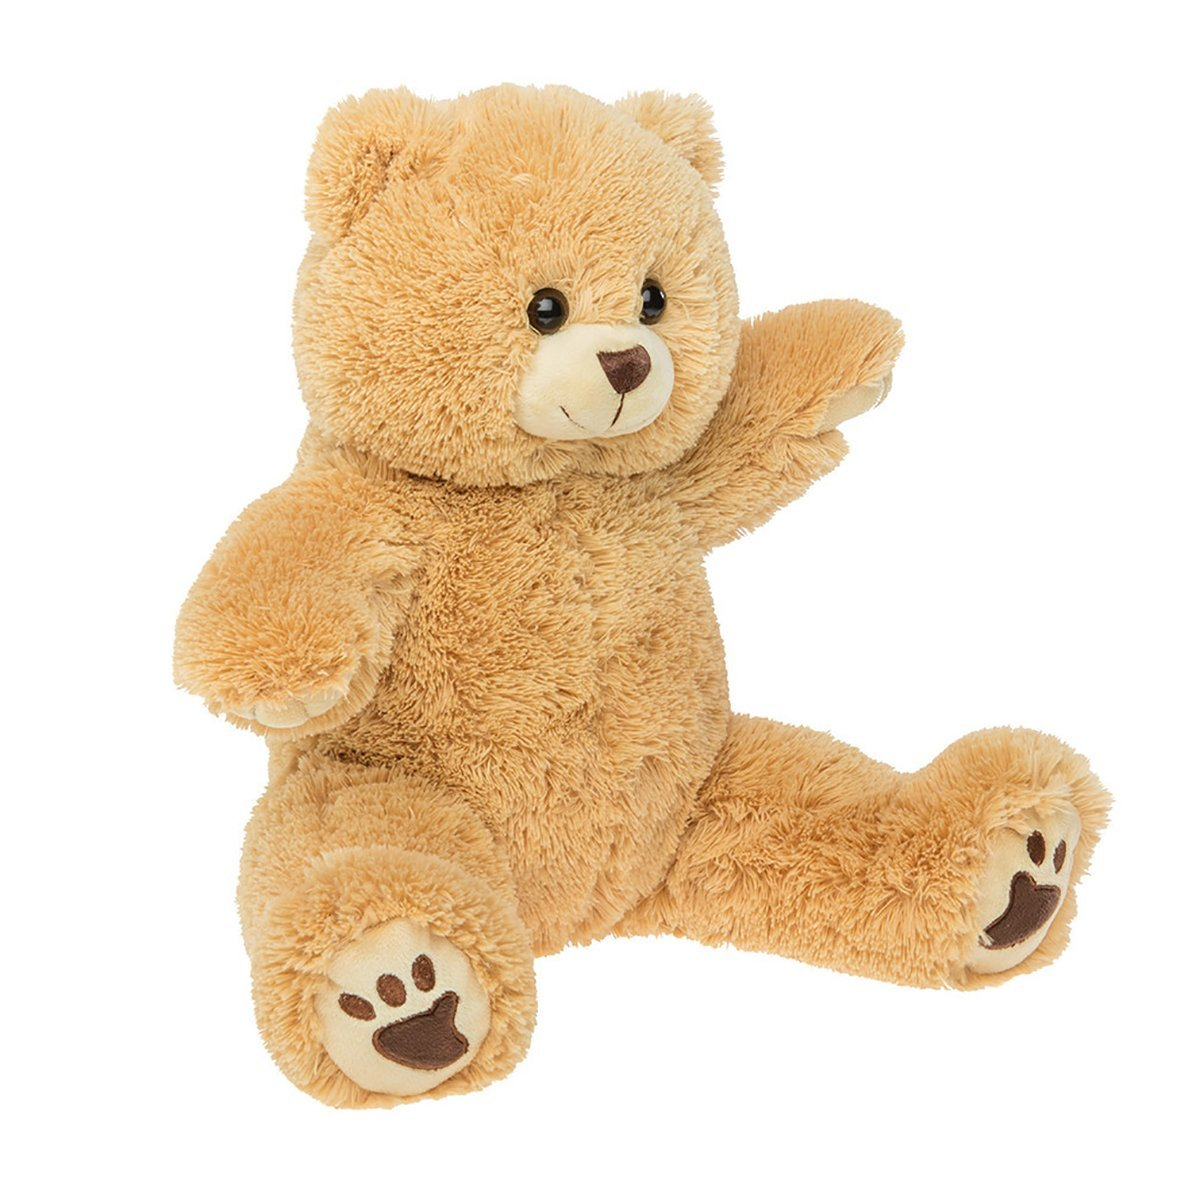 Recordable Teddy Bear Walmart, Personal Recordable Plush 15 Quot Talking Teddy Bear New Walmart Com Walmart Com